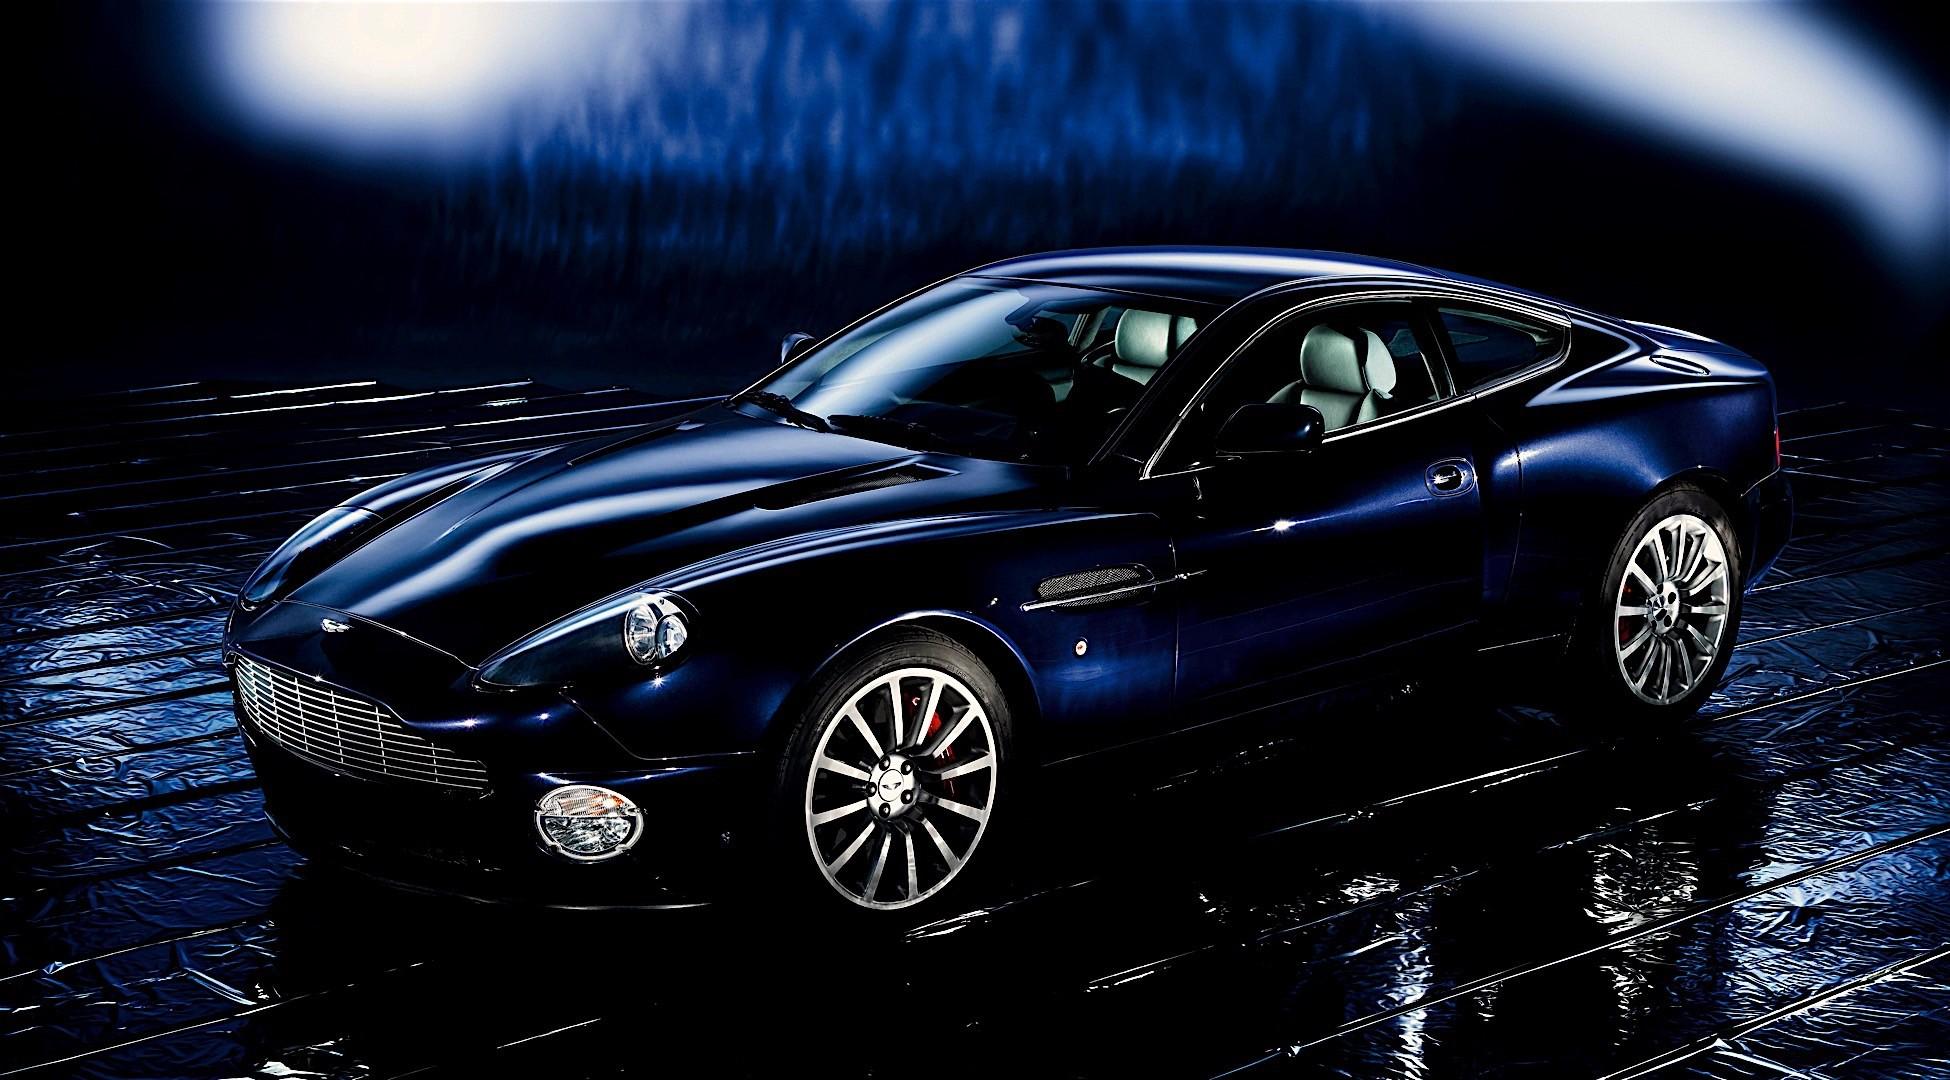 Aston Martin Vanquish S Specs 2004 2005 2006 2007